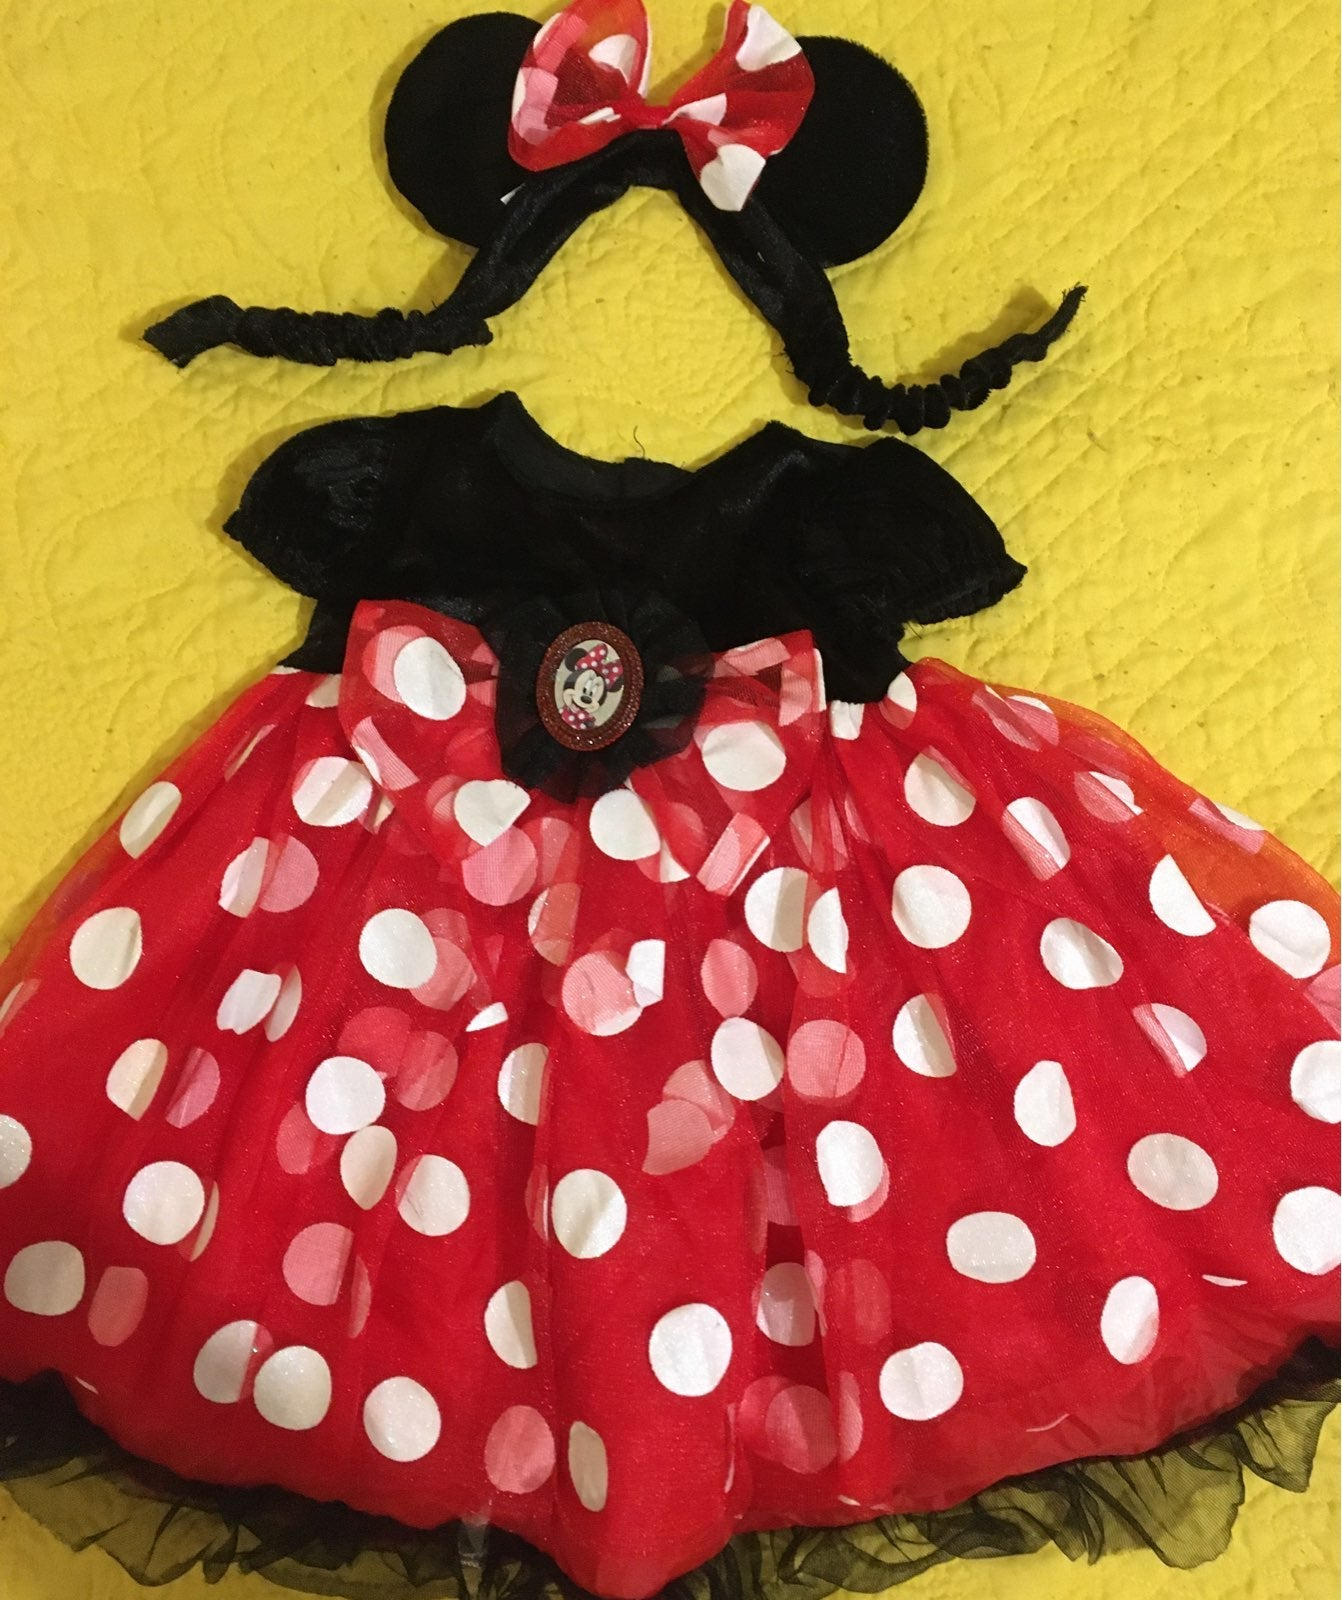 Disney Minnie Mouse dress up/ costume.